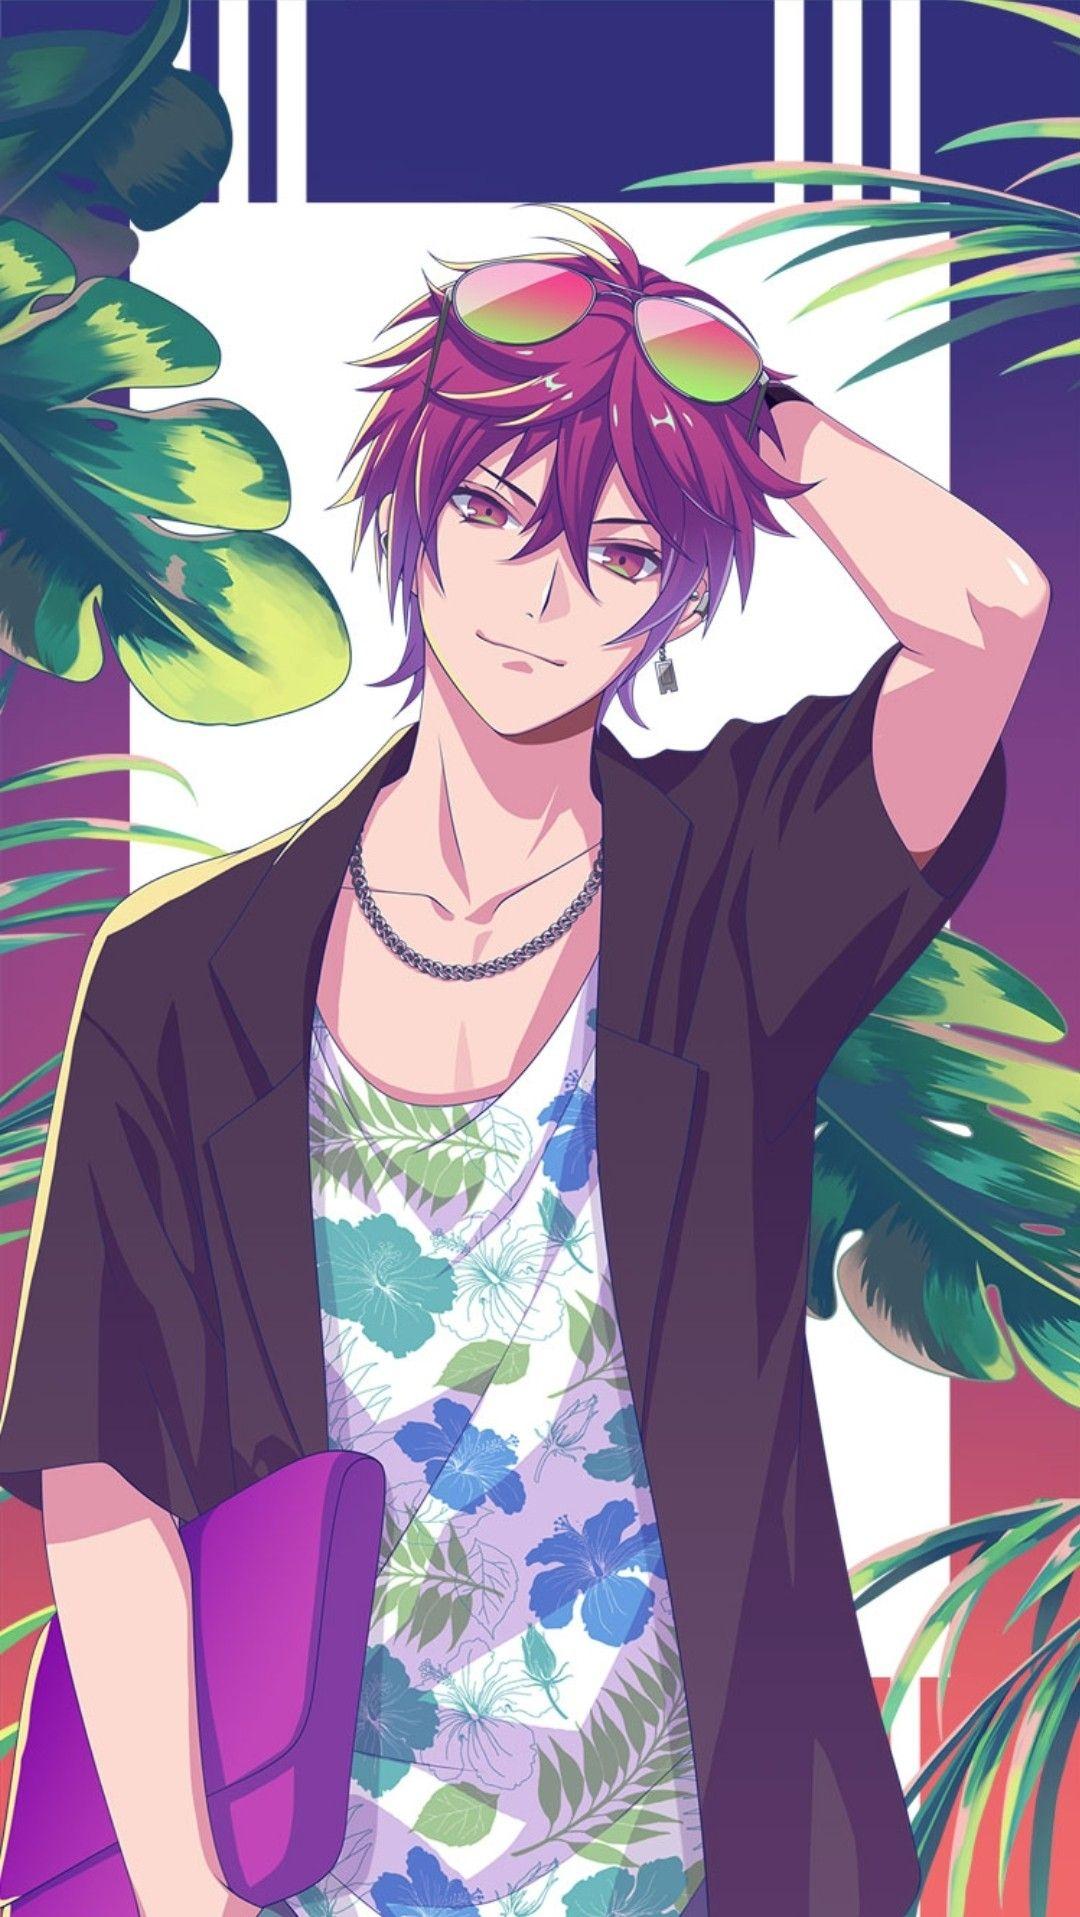 Ikemen Revolution Tropical Love Fenrir Godspeed In 2020 Anime Popular Anime Anime Prince